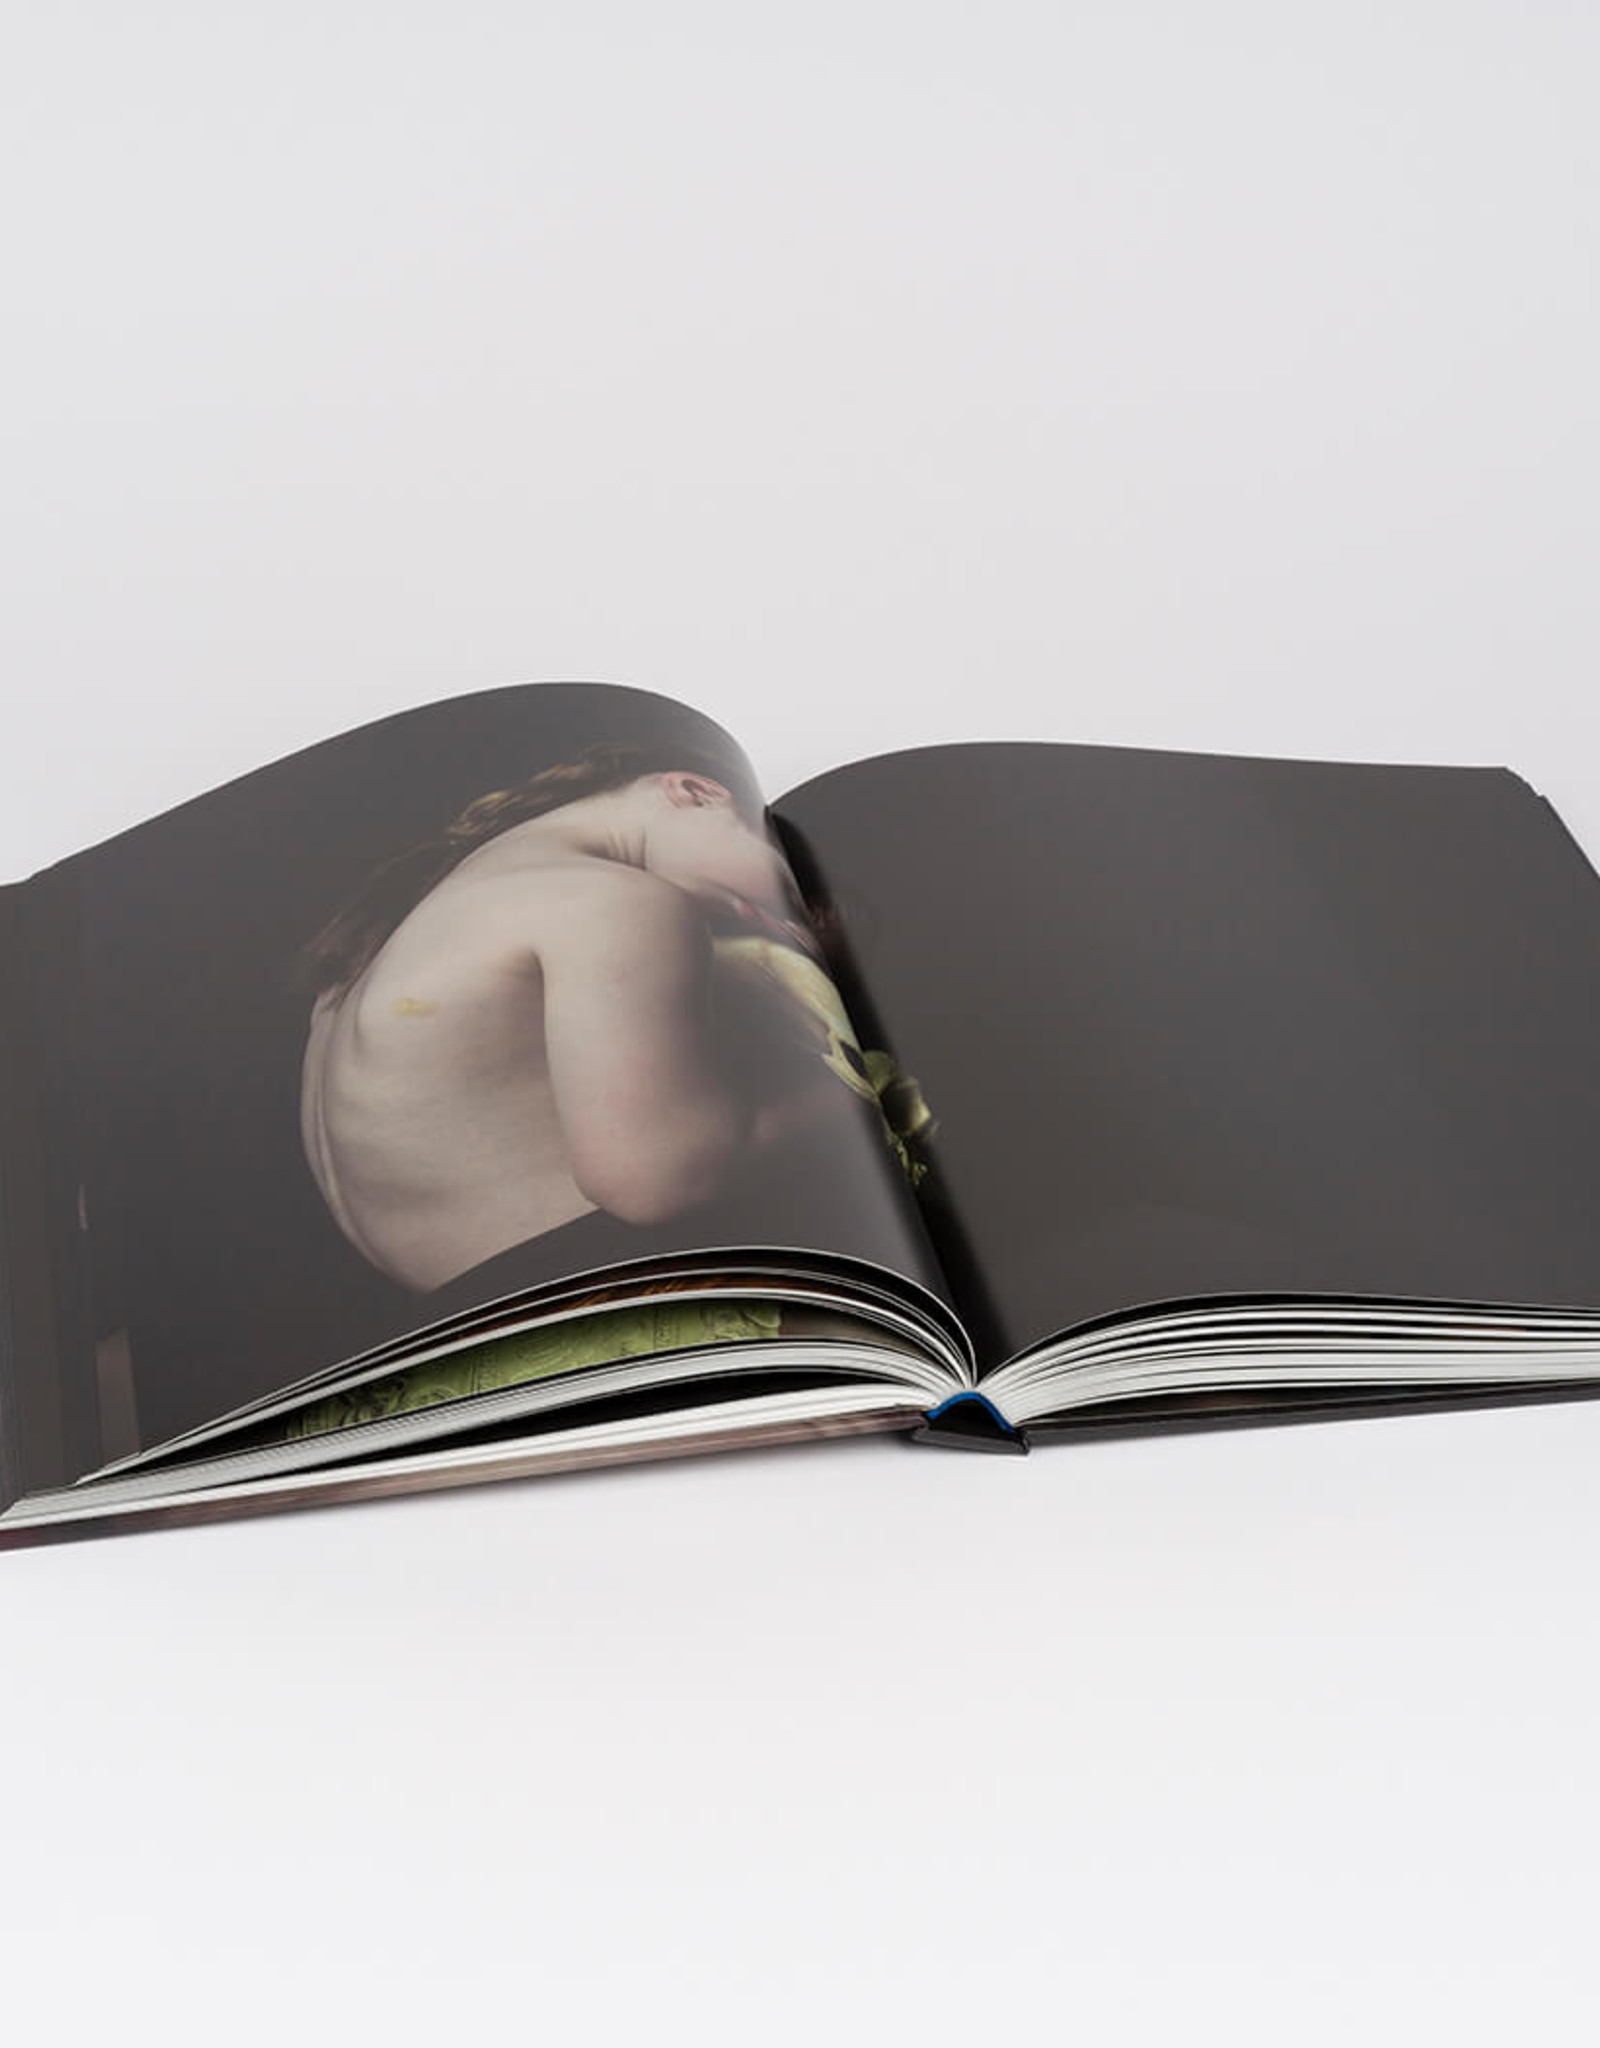 Danielle van Zadelhoff - Monografie